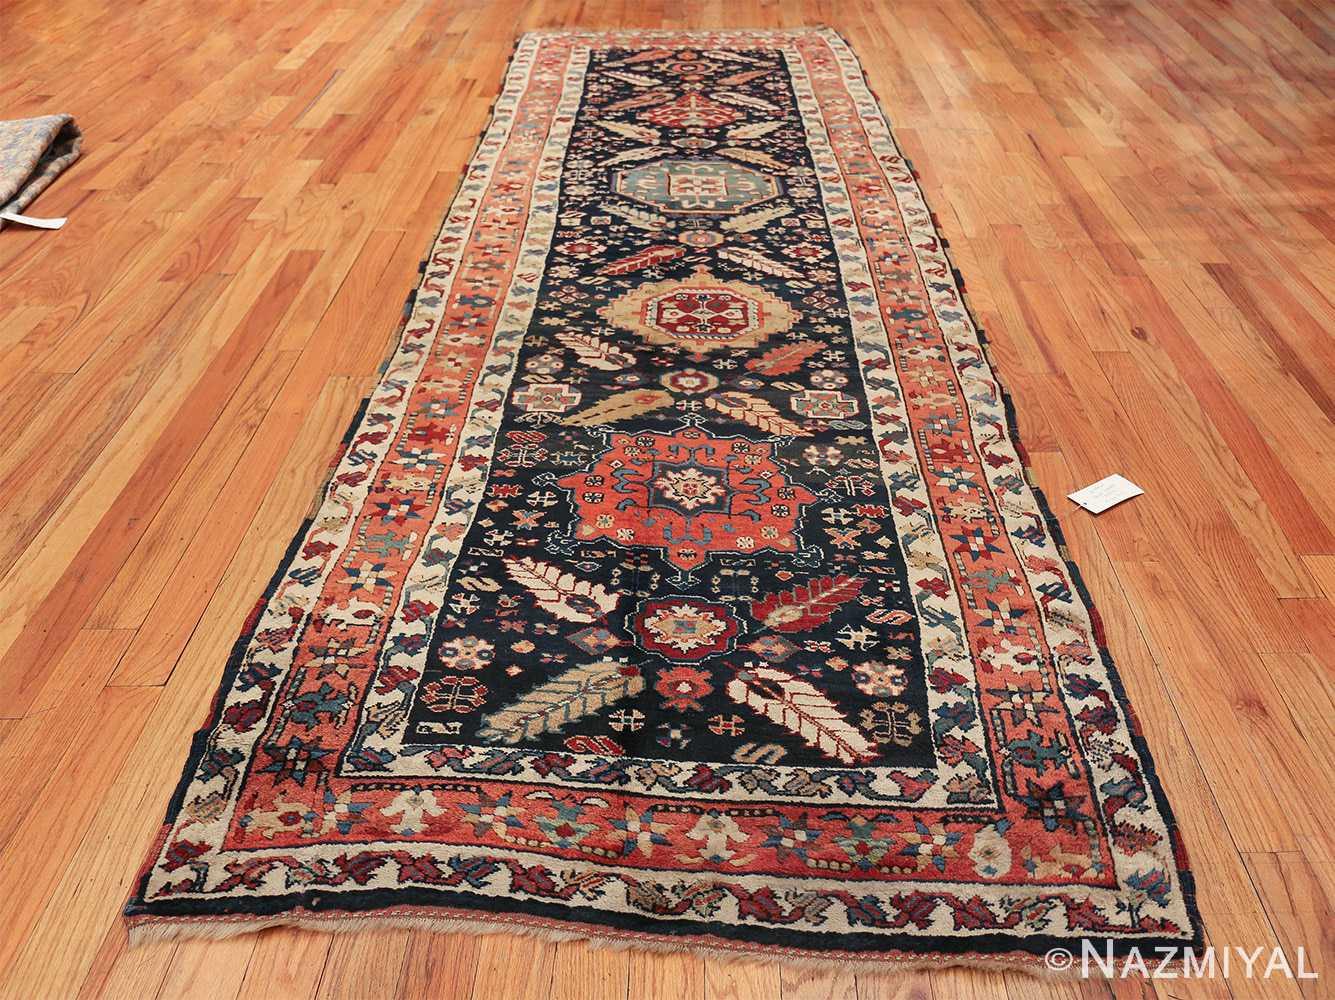 tribal antique persian northwest runner rug 49424 whole Nazmiyal